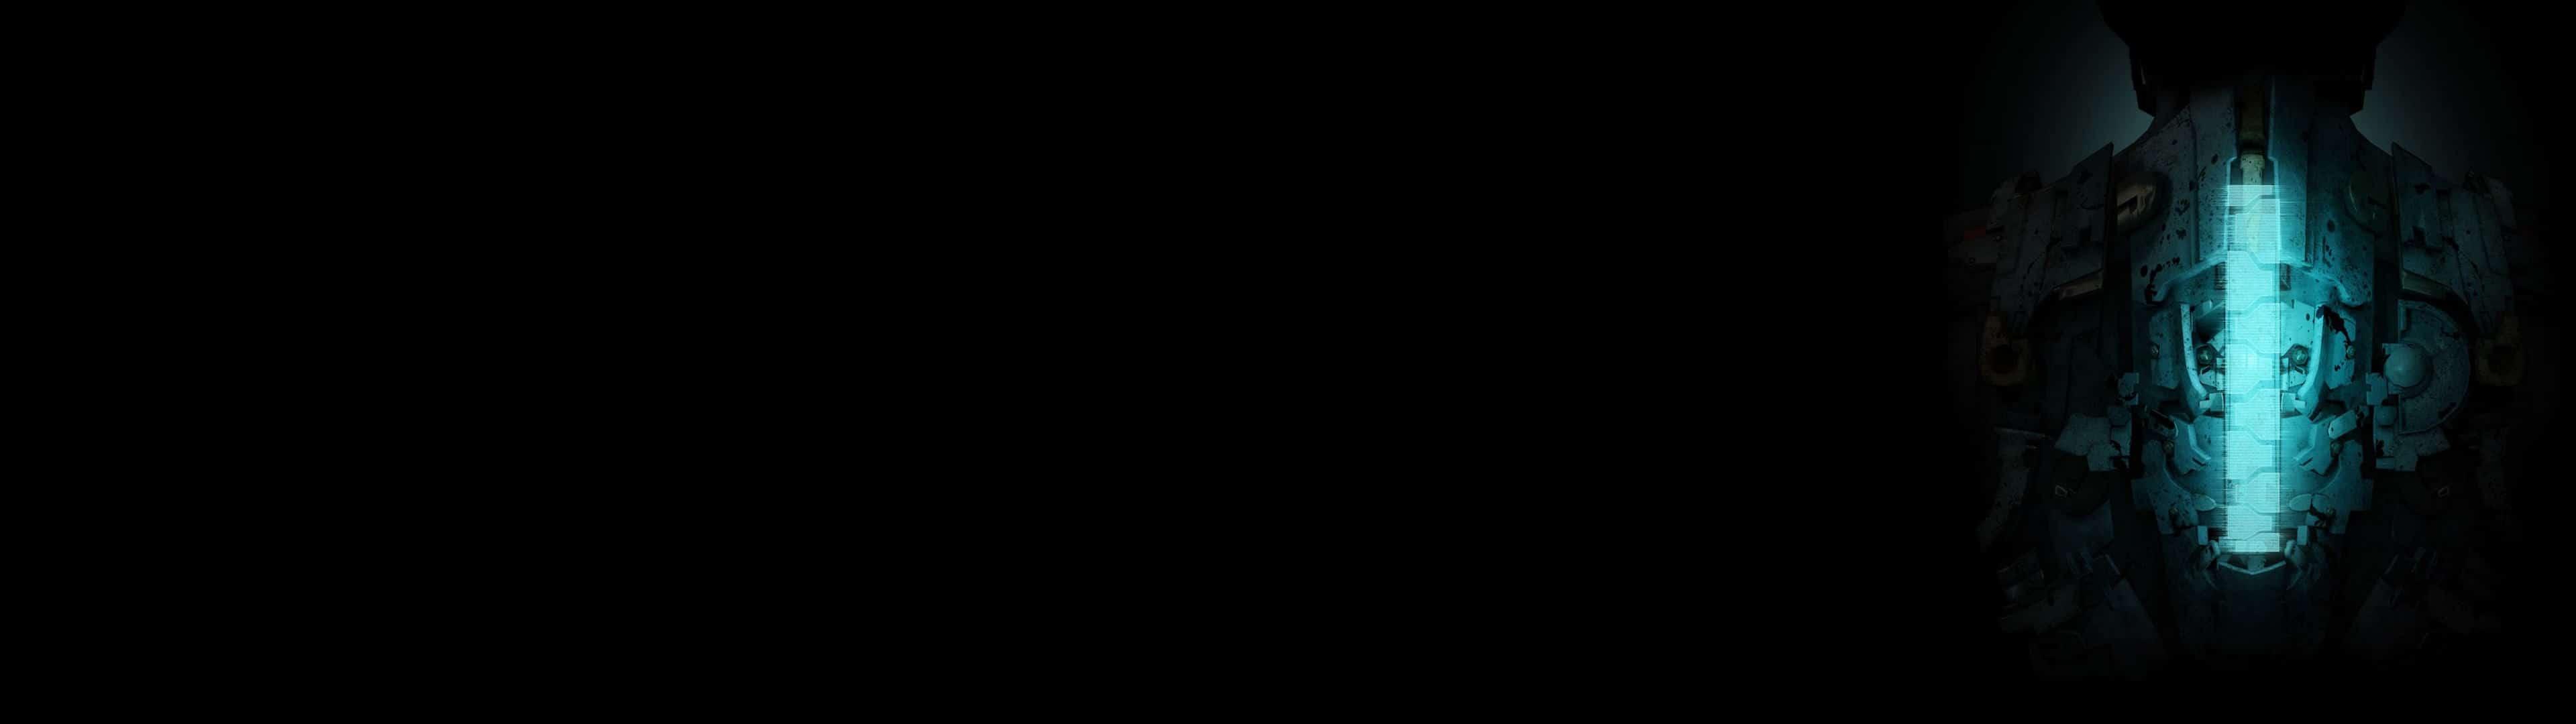 Dead Space 2 Dual Monitor Wallpaper Pixelz